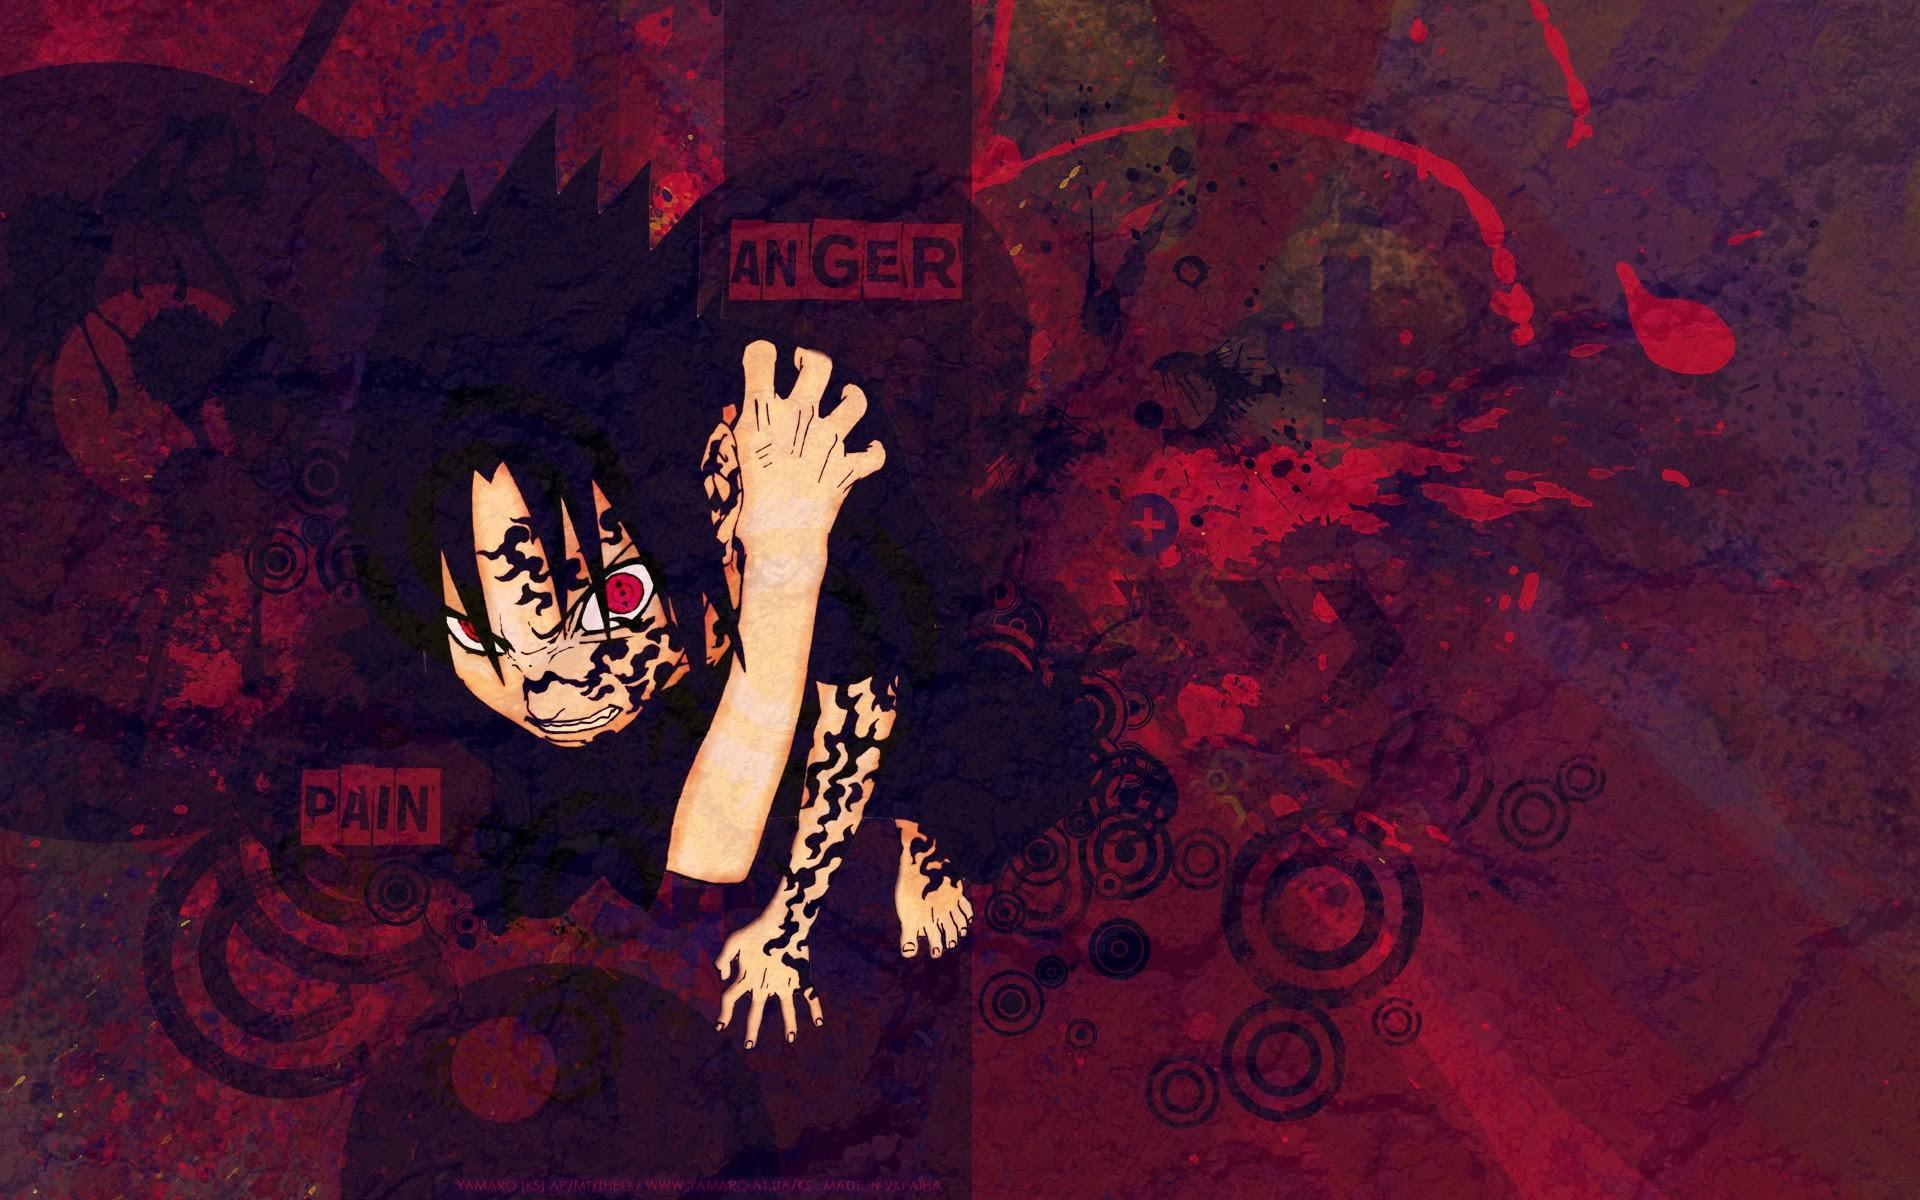 sharingan and curse seal sasuke uchiha hd anime wallpaper 1920×1200